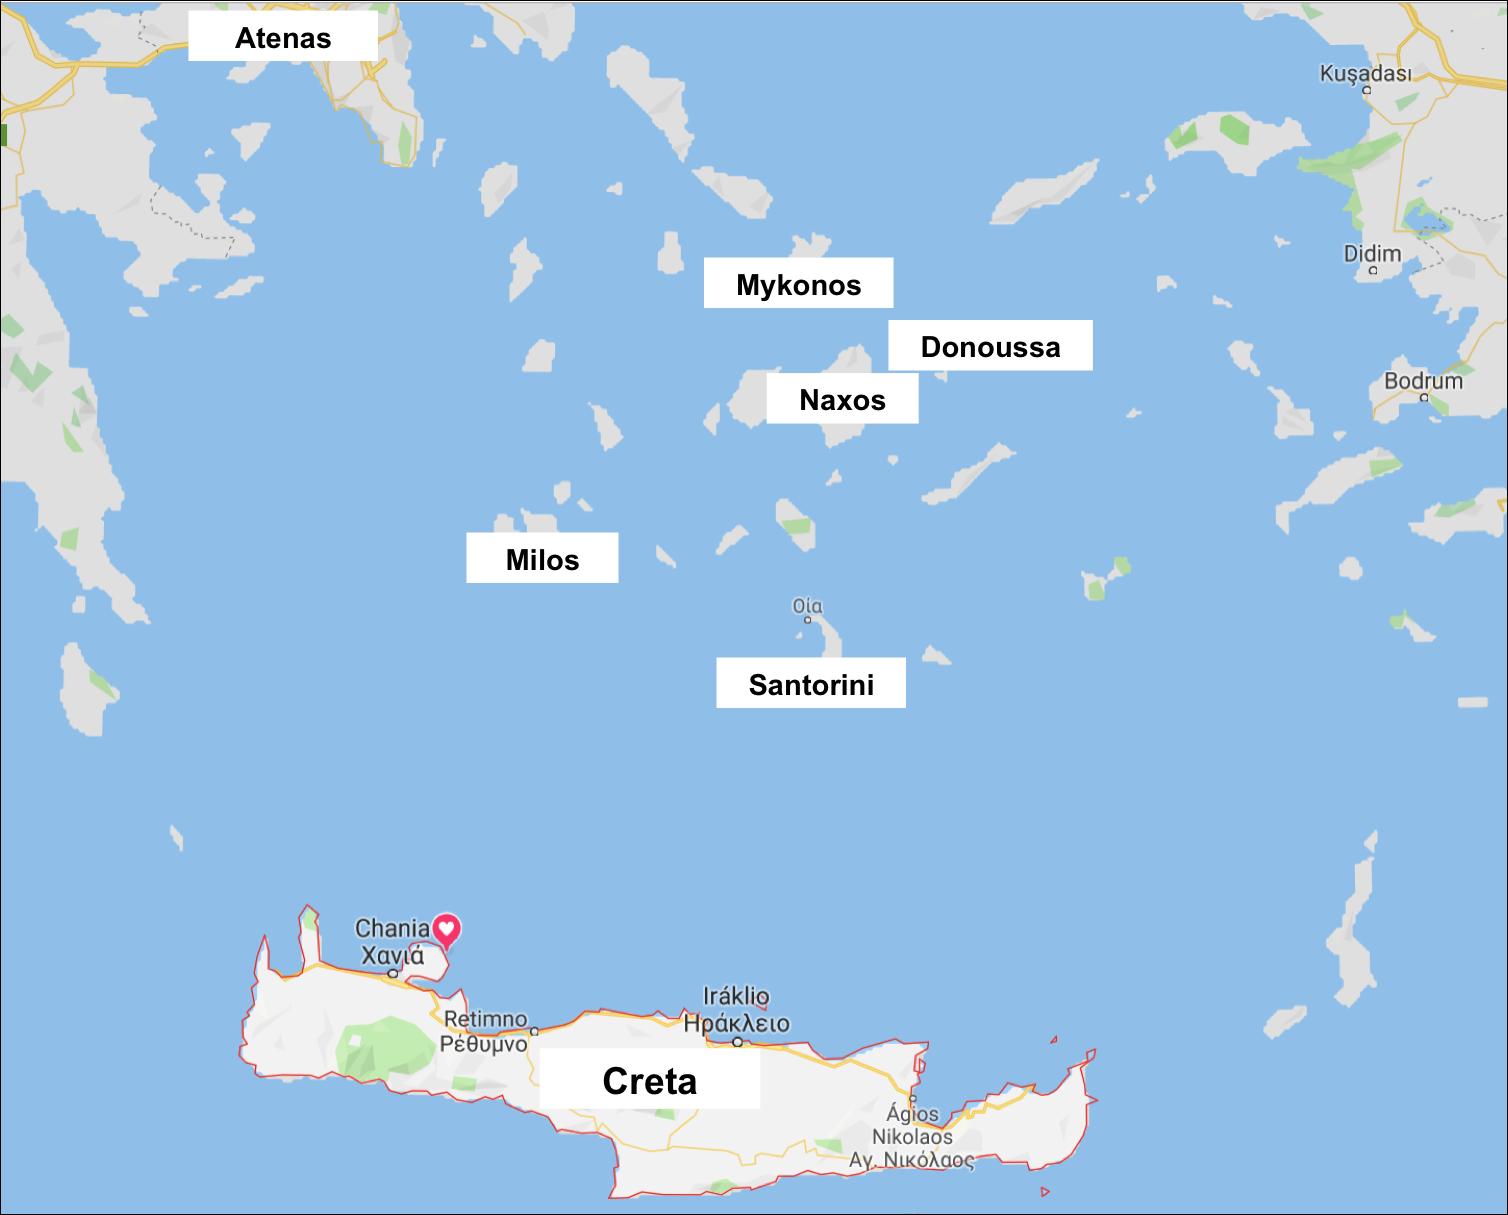 Mapa ilhas Cíclades e Creta